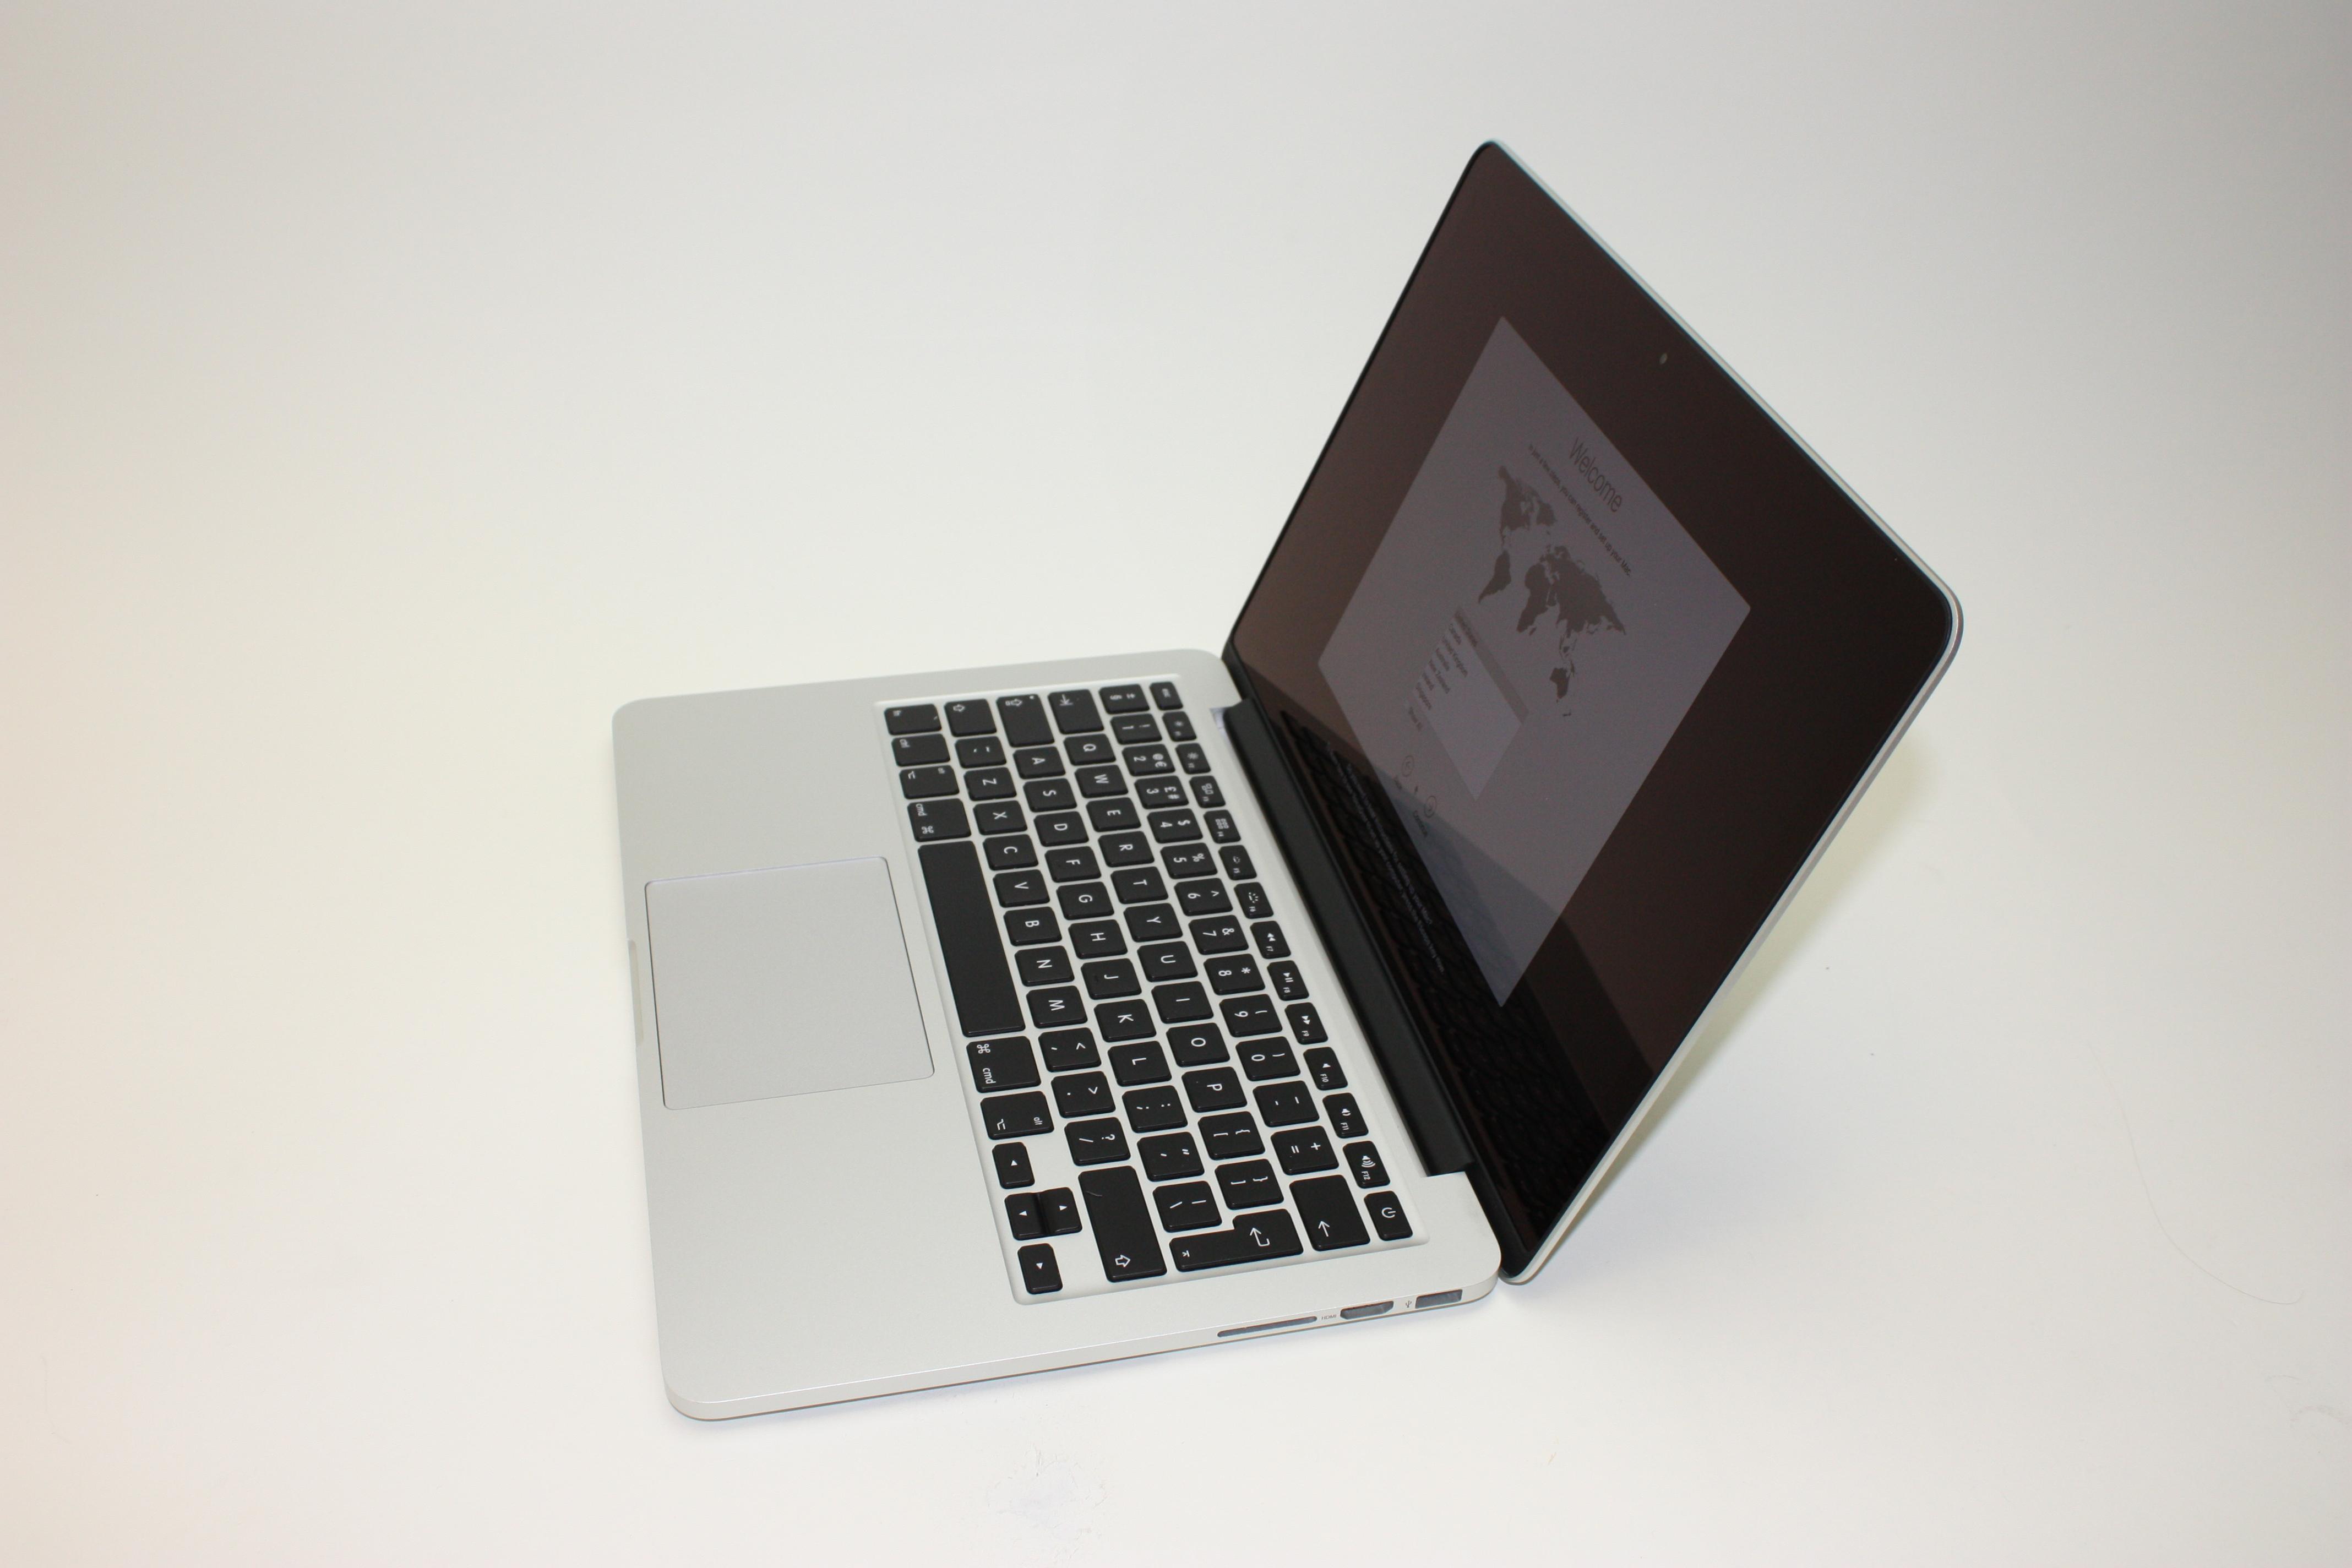 MacBook Pro 13-inch Retina, 2.7 GHz Core i5 (I5-5257U), 8 GB 1867 MHz DDR3, 128 GB Flash Storage, image 2